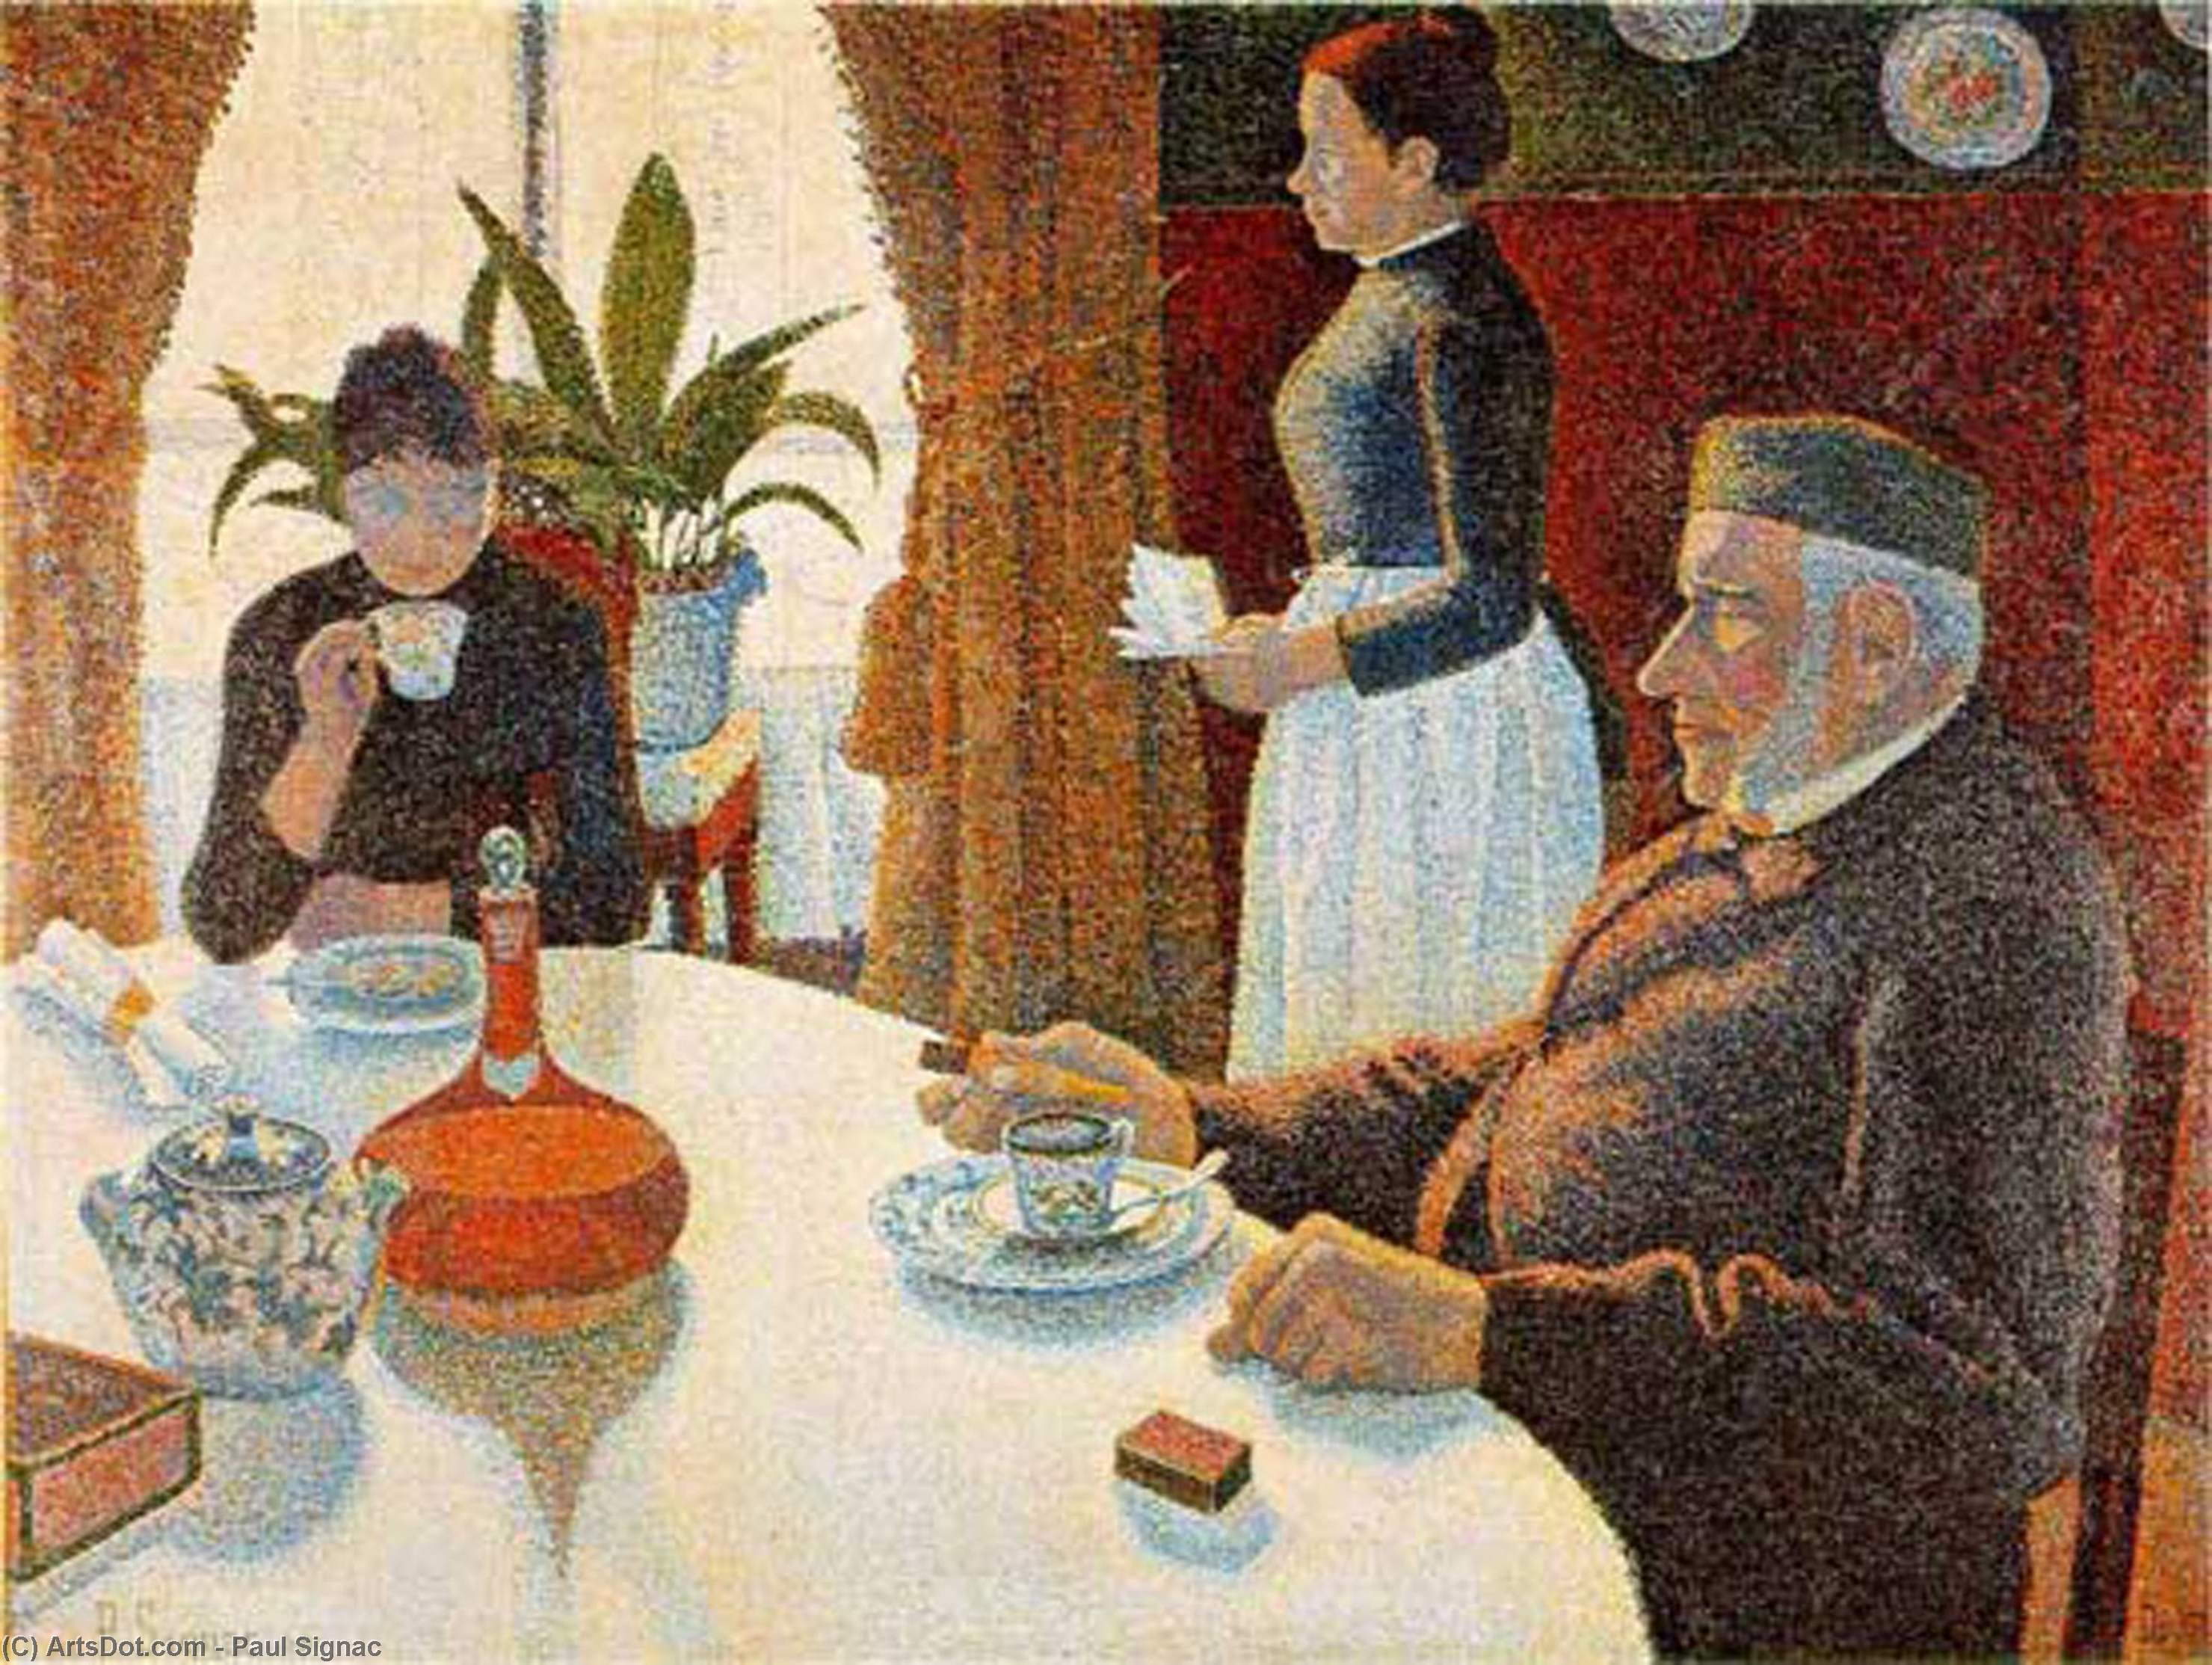 Breakfast (The Dining Room) - Paul Signac